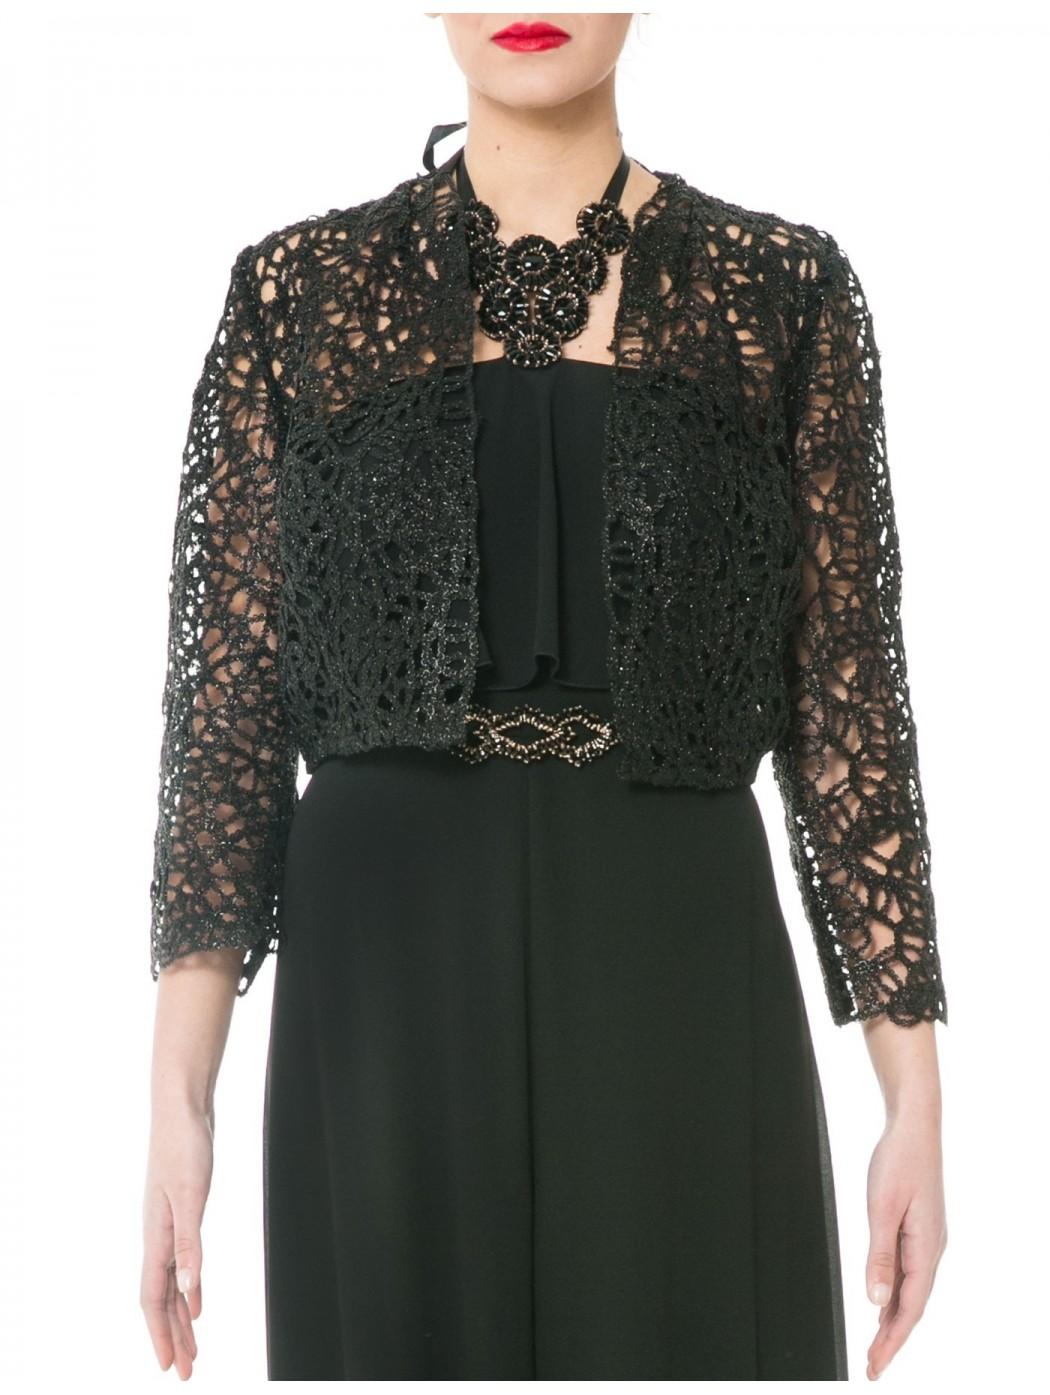 Sonia Pena 1170161 black bolero shrug jacket